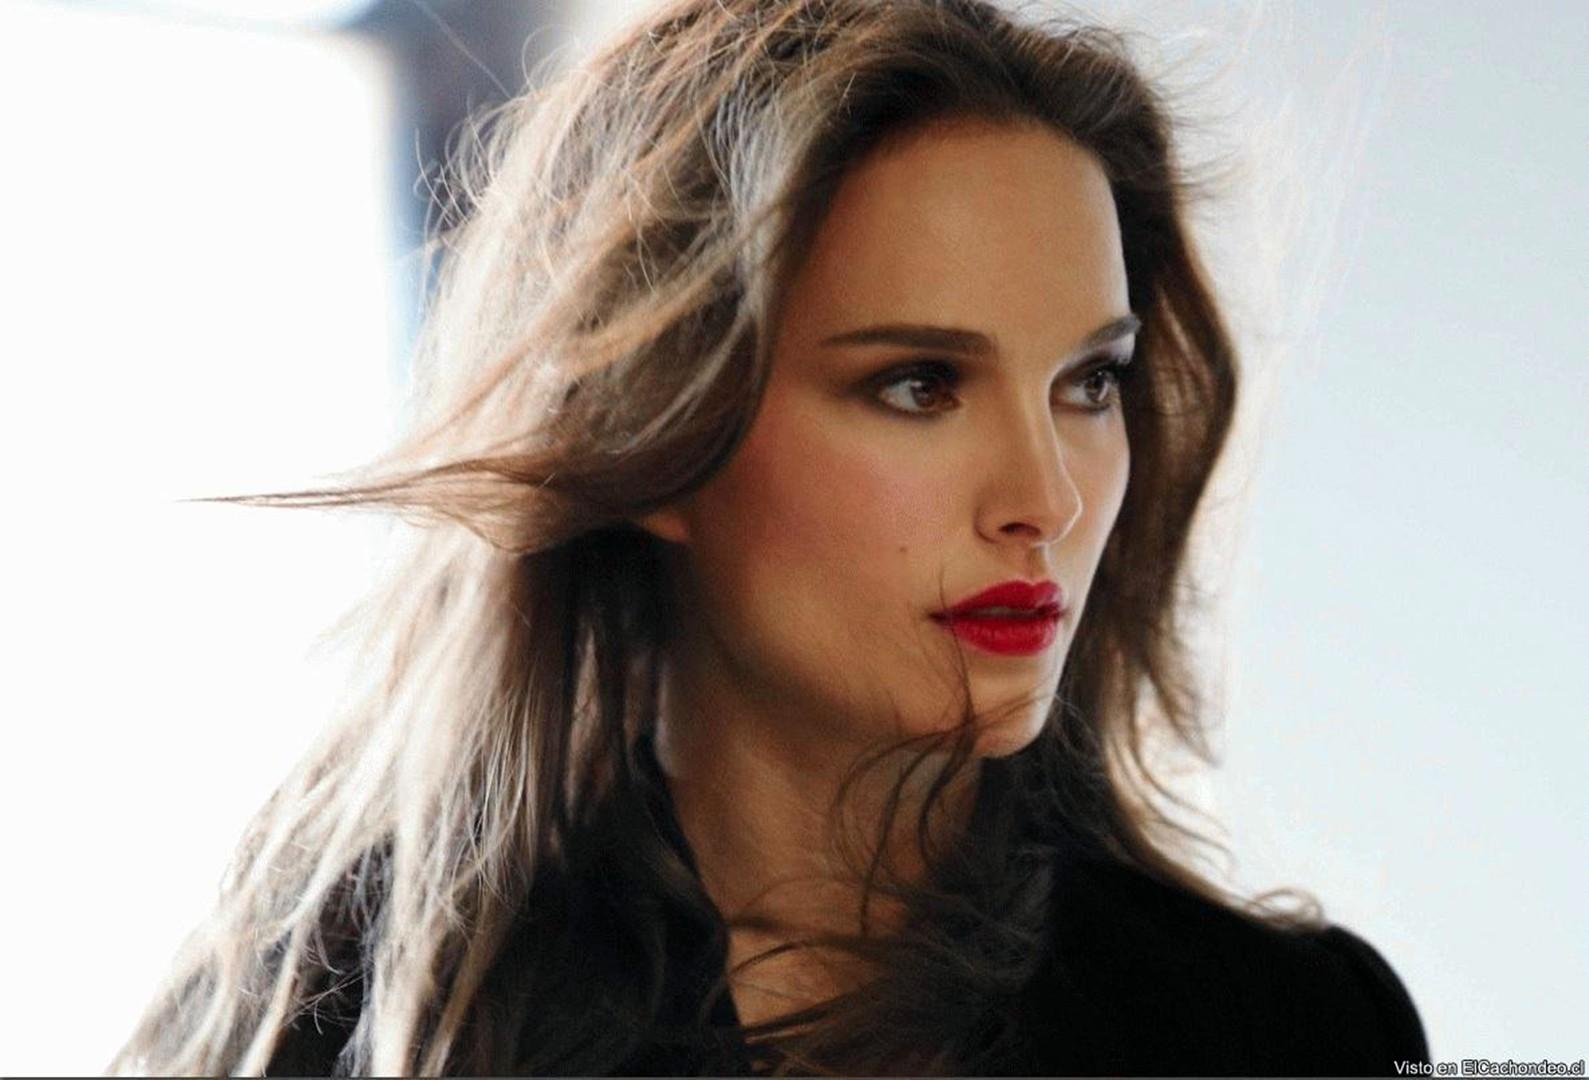 Frisuren Frauen Lange Nase - Aktuelle Frisur